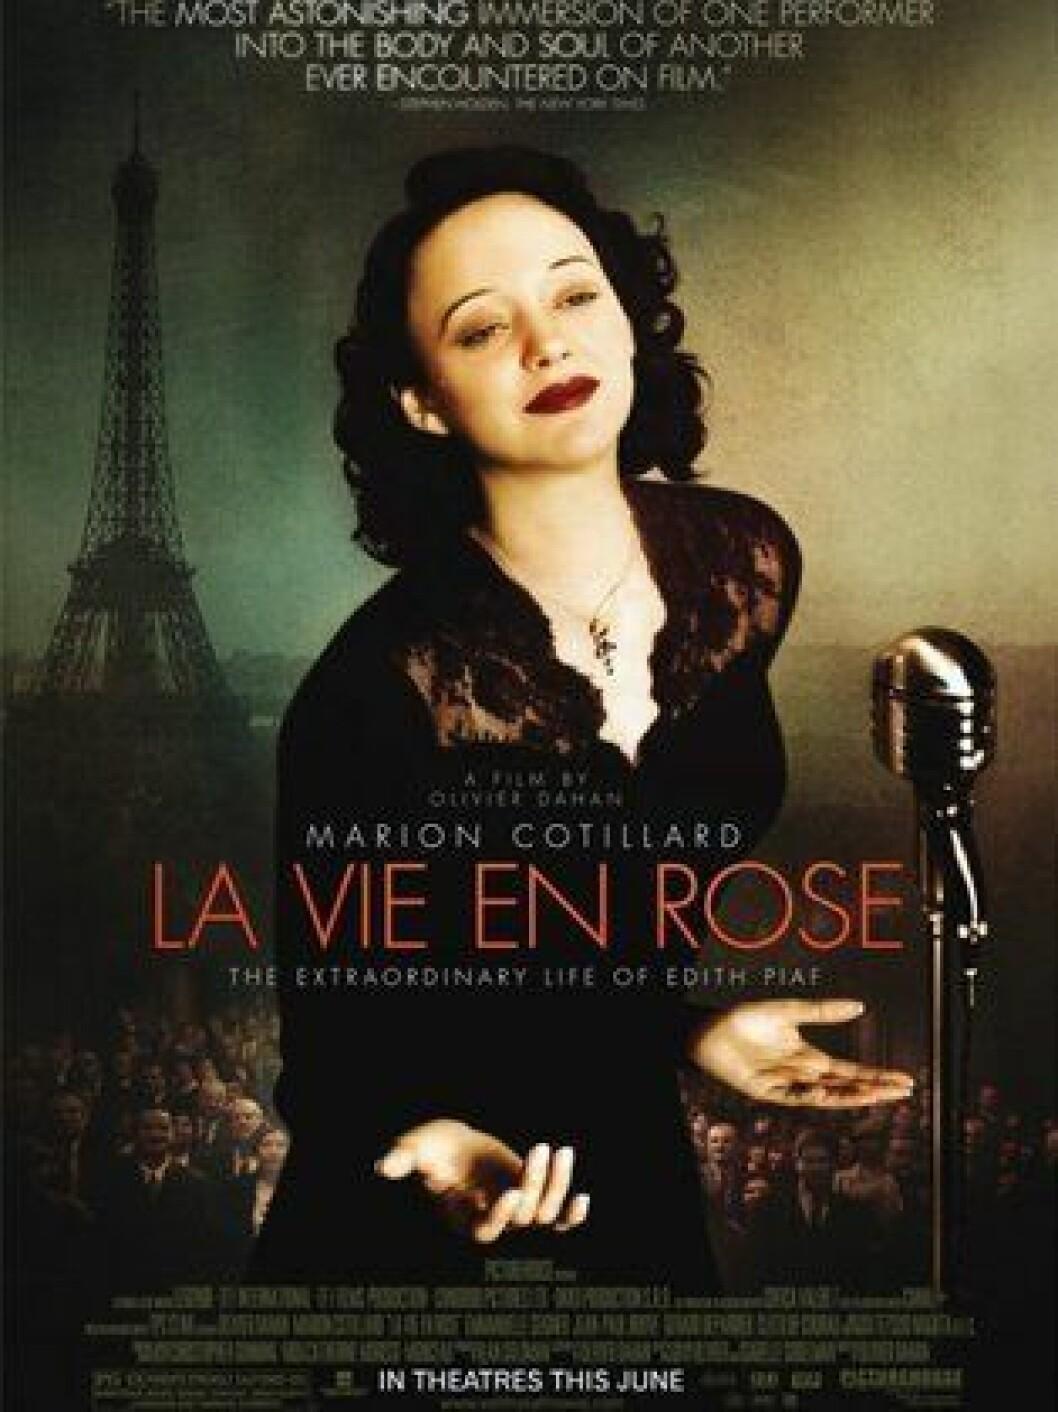 Dokumentären La vie en rose